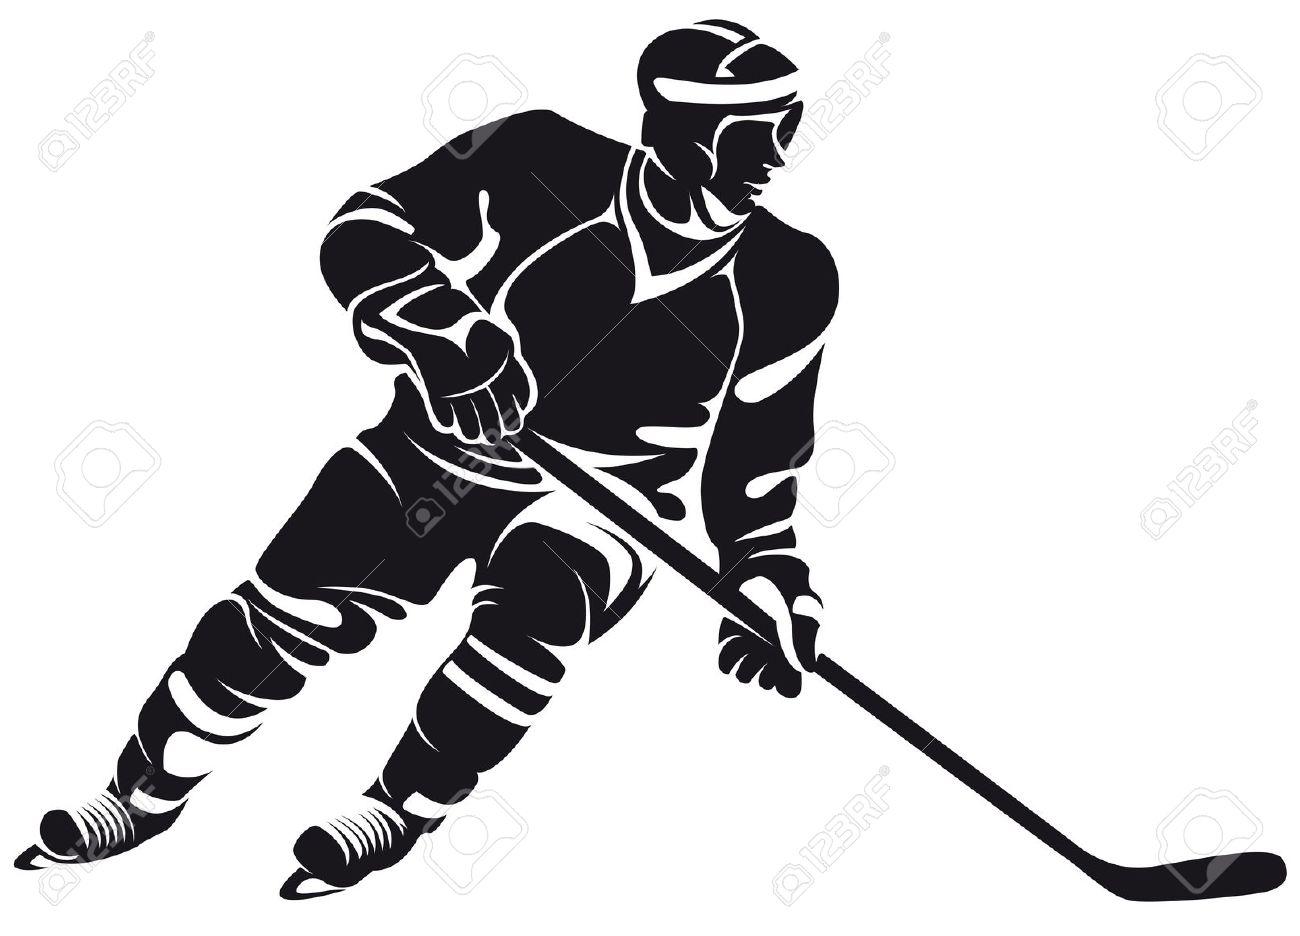 Free Hockey Vector Art at GetDrawings.com.